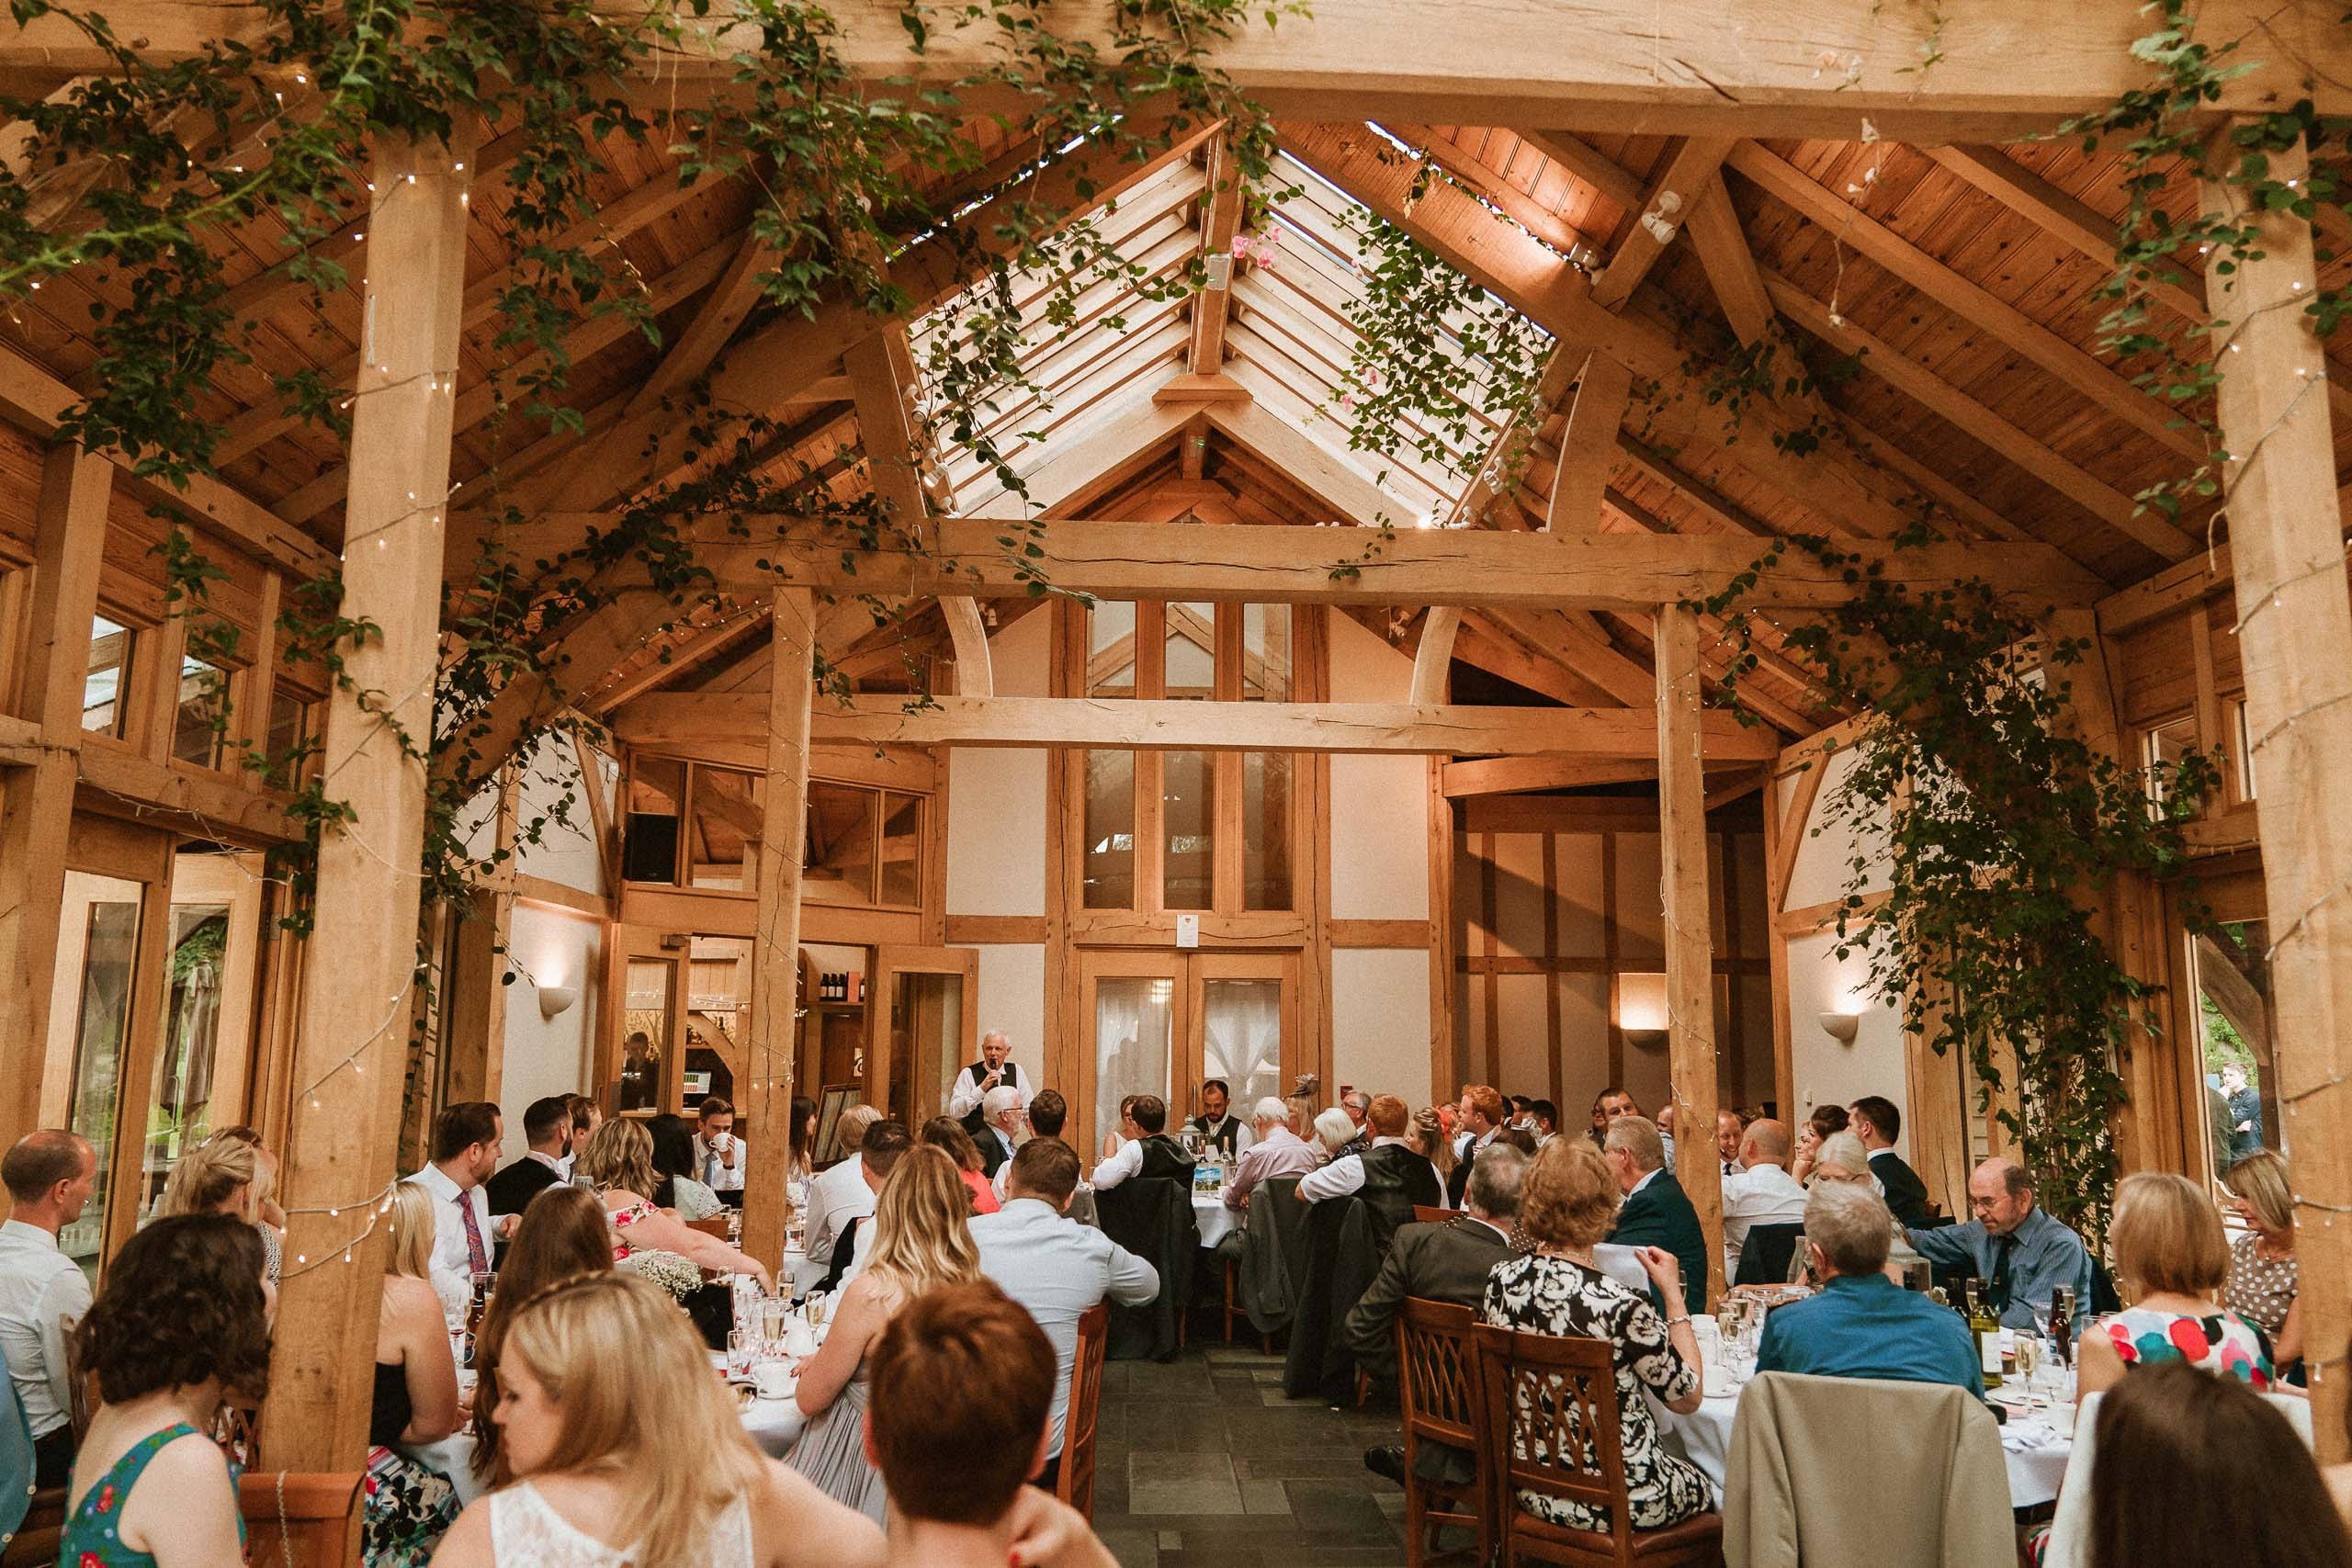 wide interior image of wedding barn